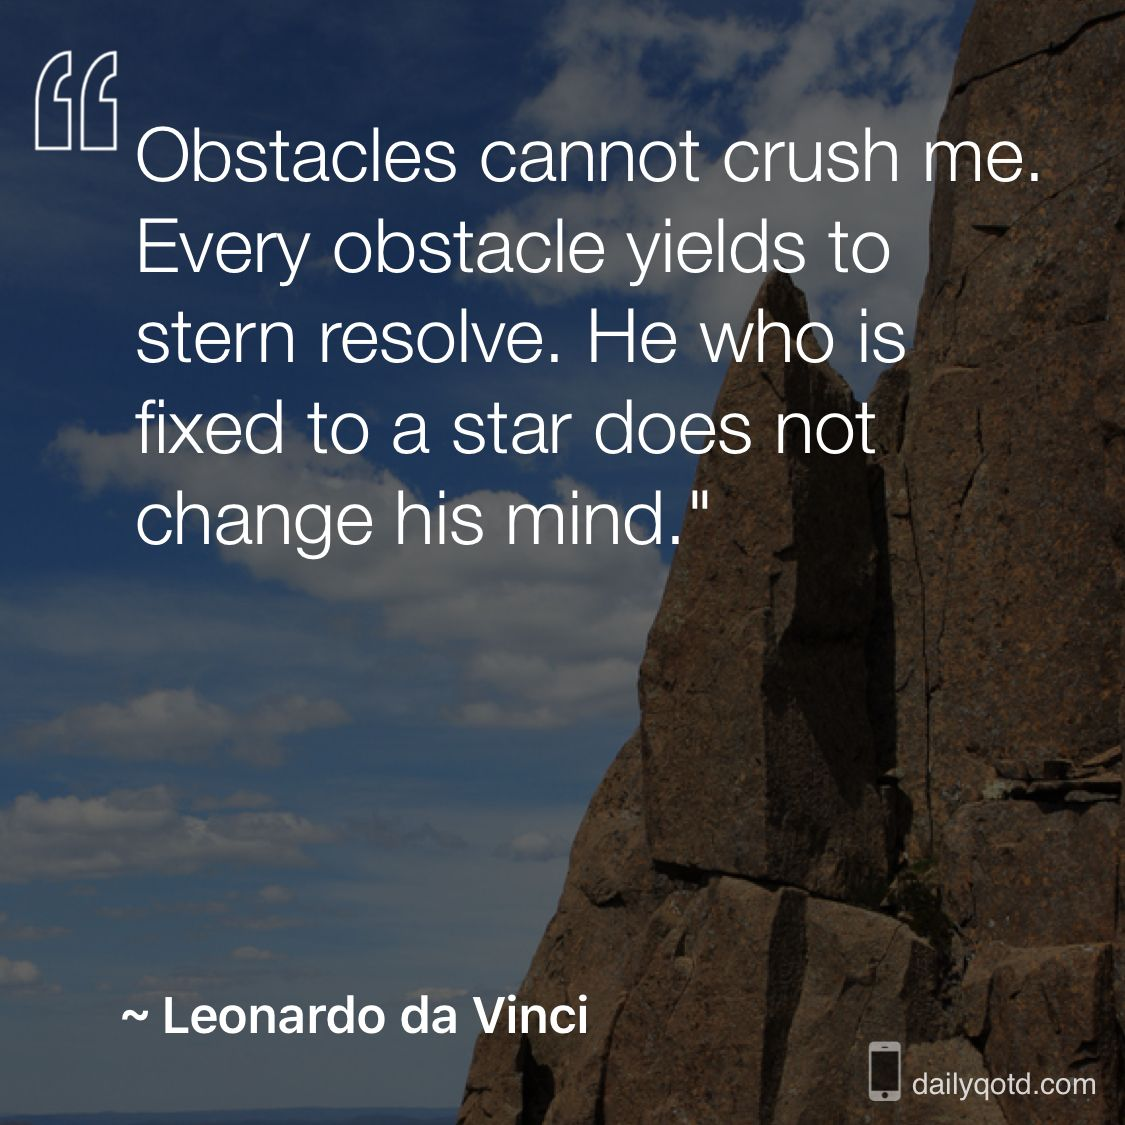 dailyqotd qotd Inspirational quotes motivation, Daily